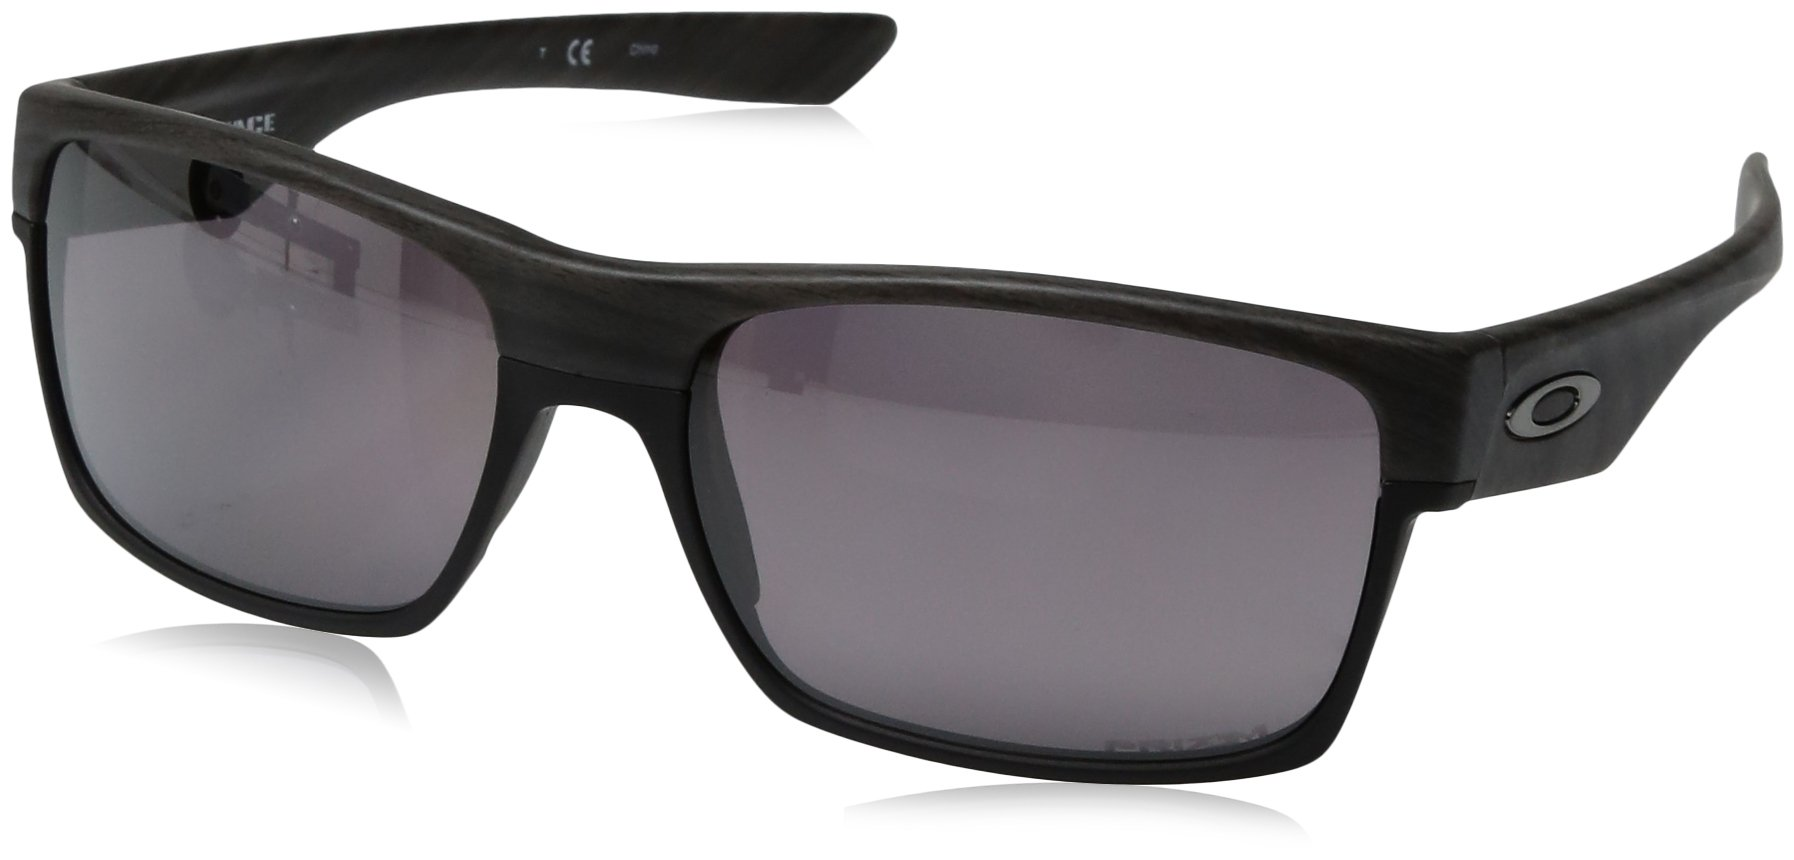 Oakley Men's OO9189 TwoFace Square Sunglasses, Woodgrain/Prizm Daily Polarized, 60 mm